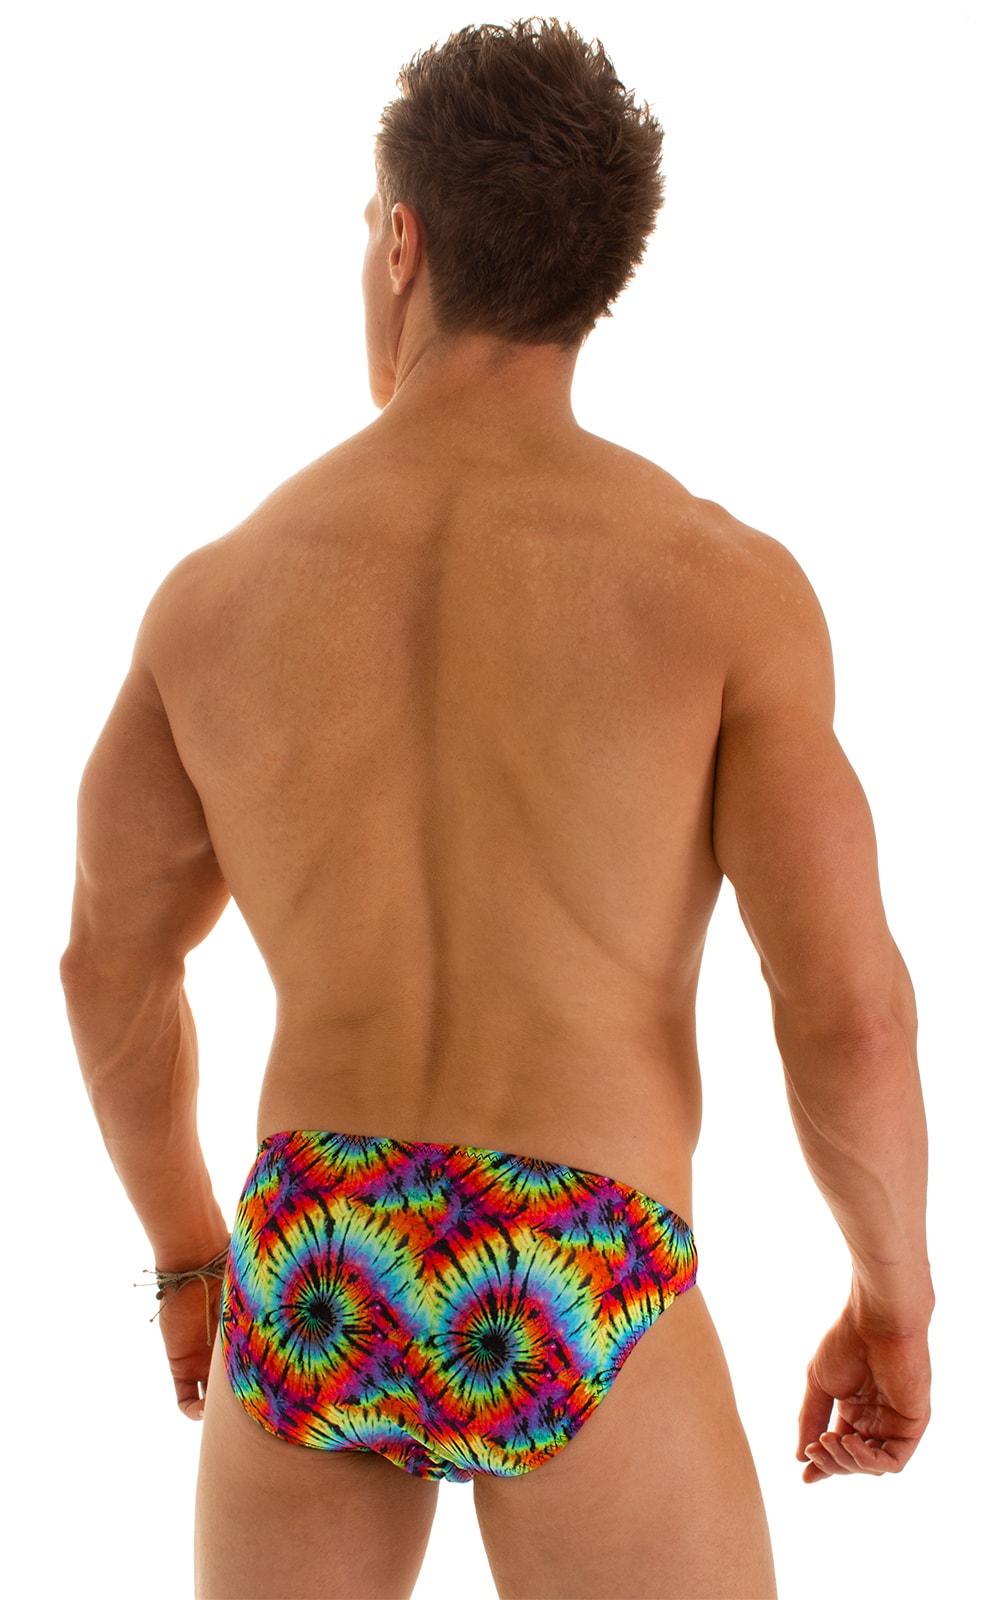 Bikini-Brief Swimsuit in Classic Tie Dye 2